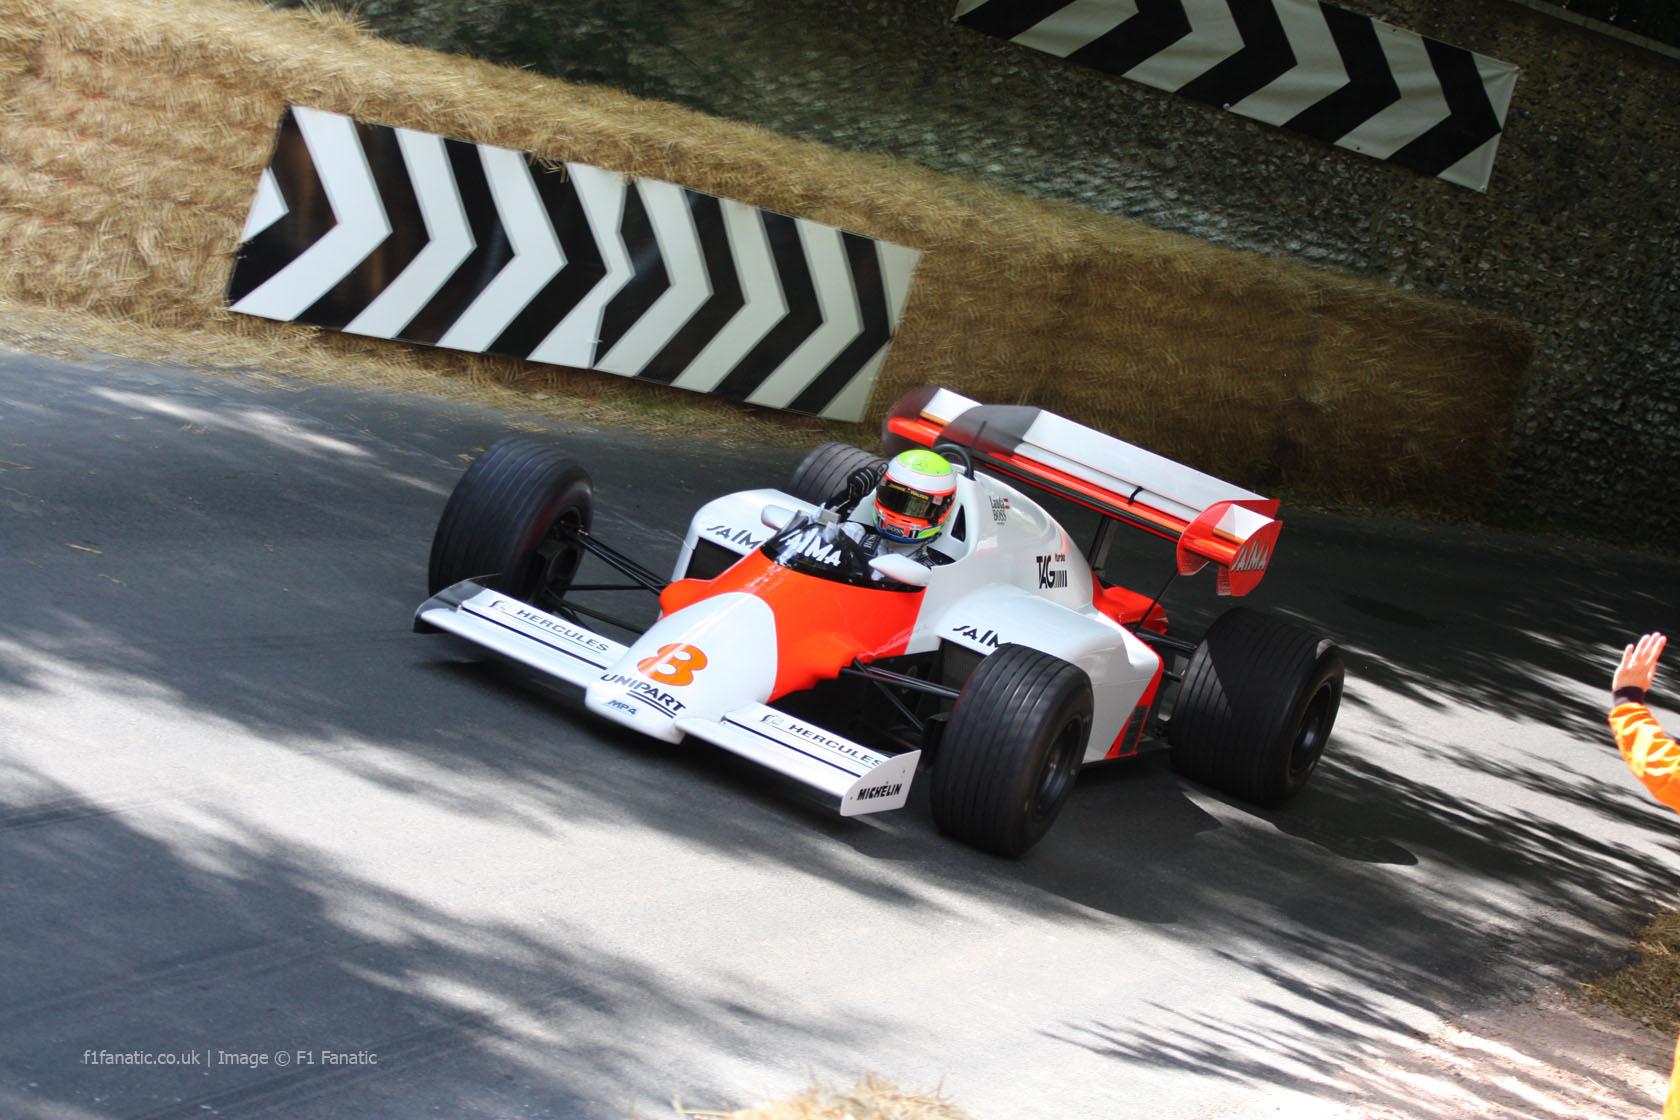 McLaren MP4-2 (1), Goodwood Festival of Speed, 2014